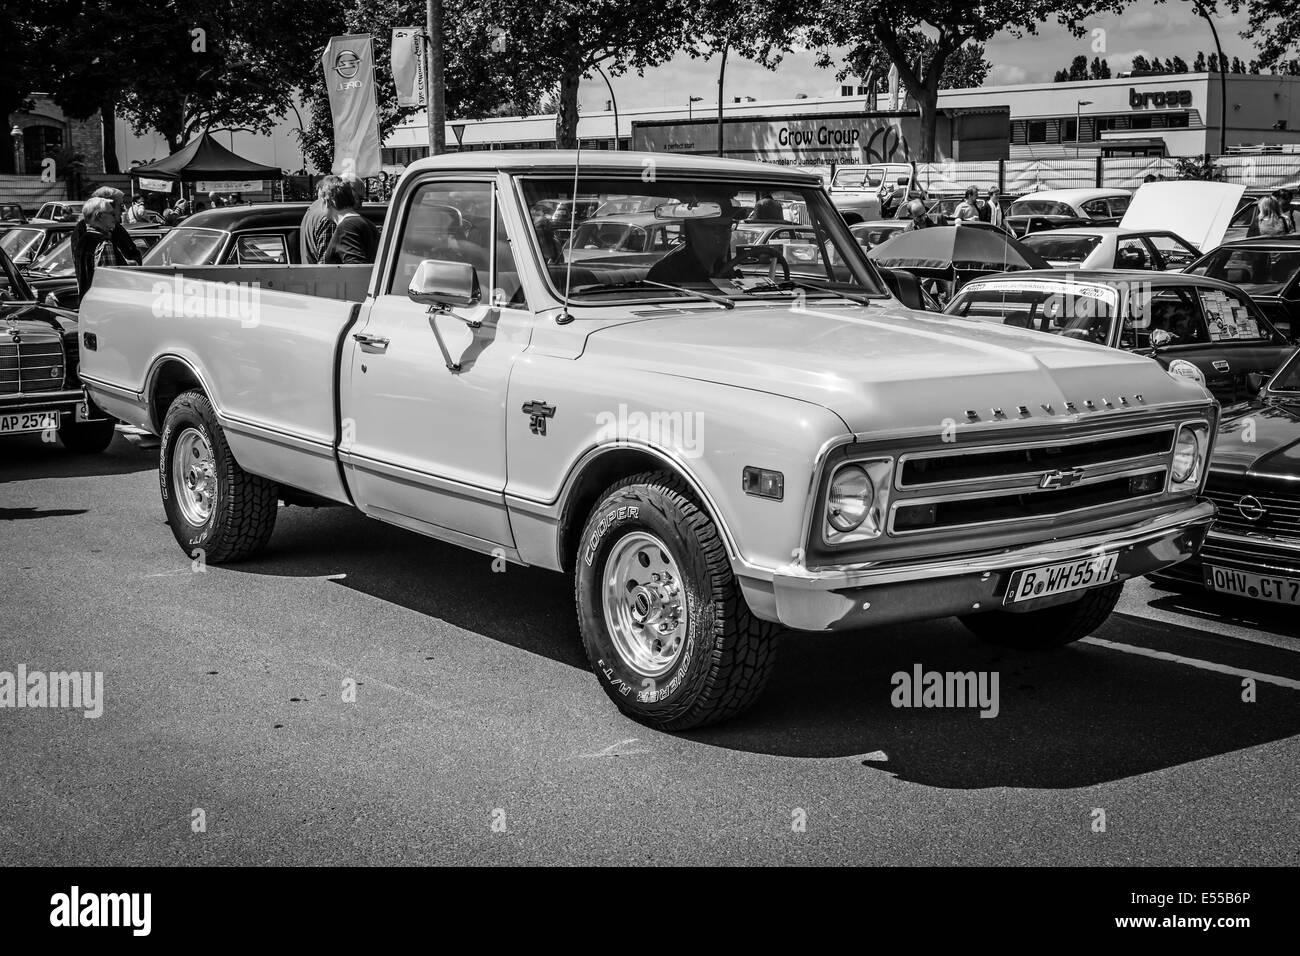 hight resolution of berlin germany may 17 2014 full size pickup truck chevrolet c20 black and white 27th oldtimer day berlin brandenburg